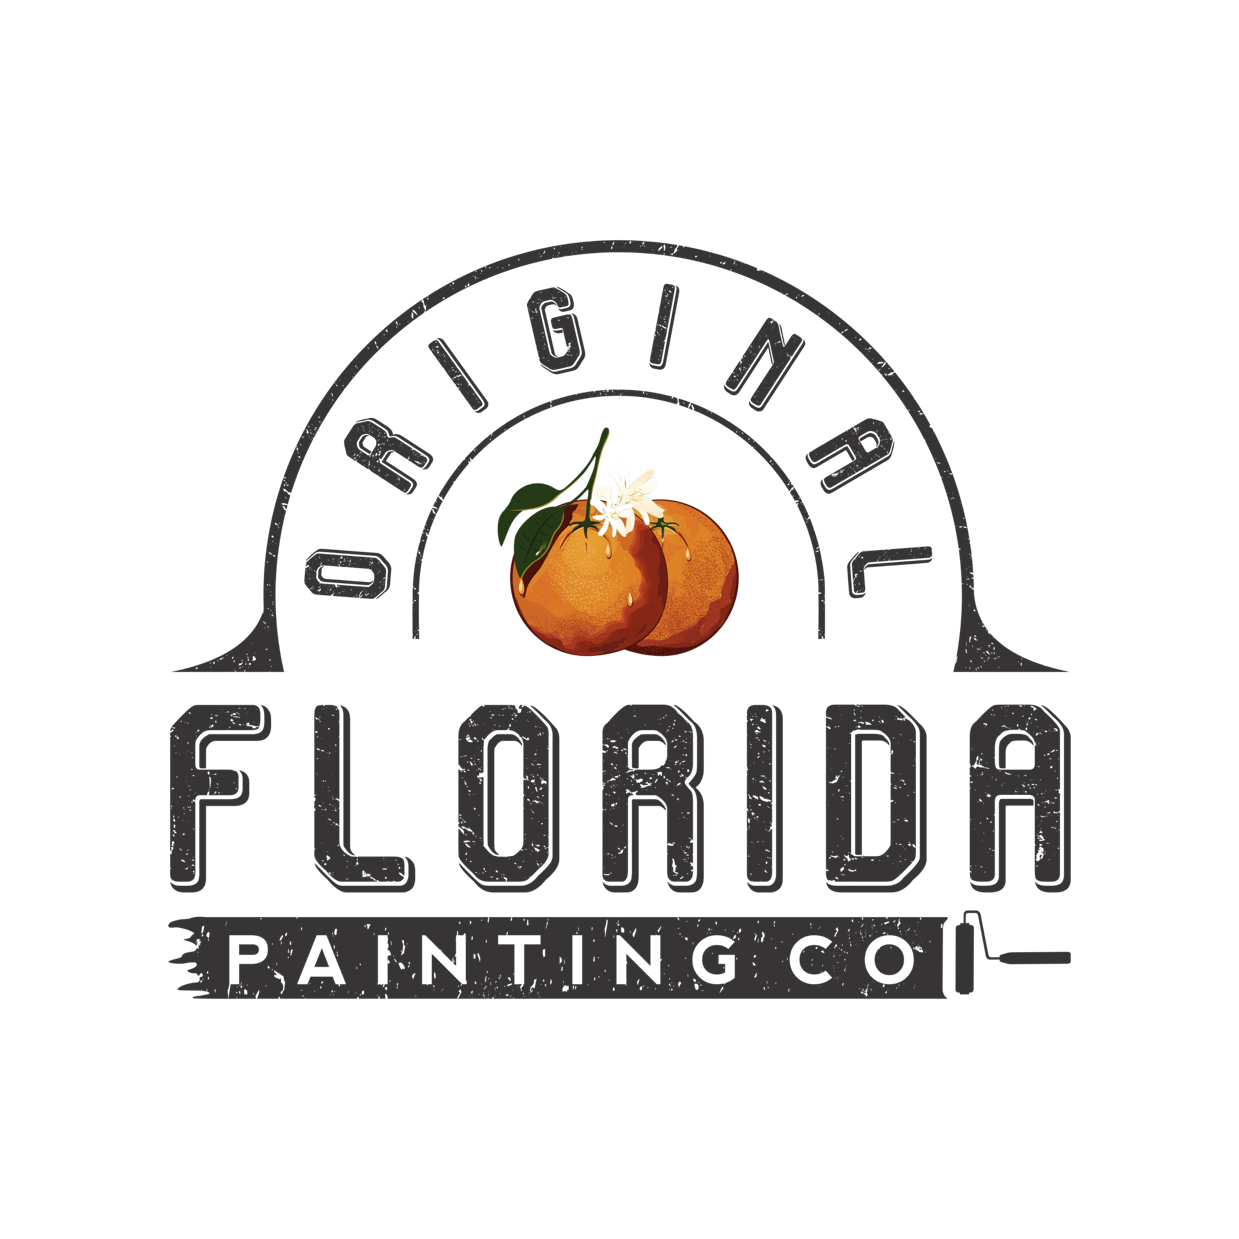 Original Florida Painting Co